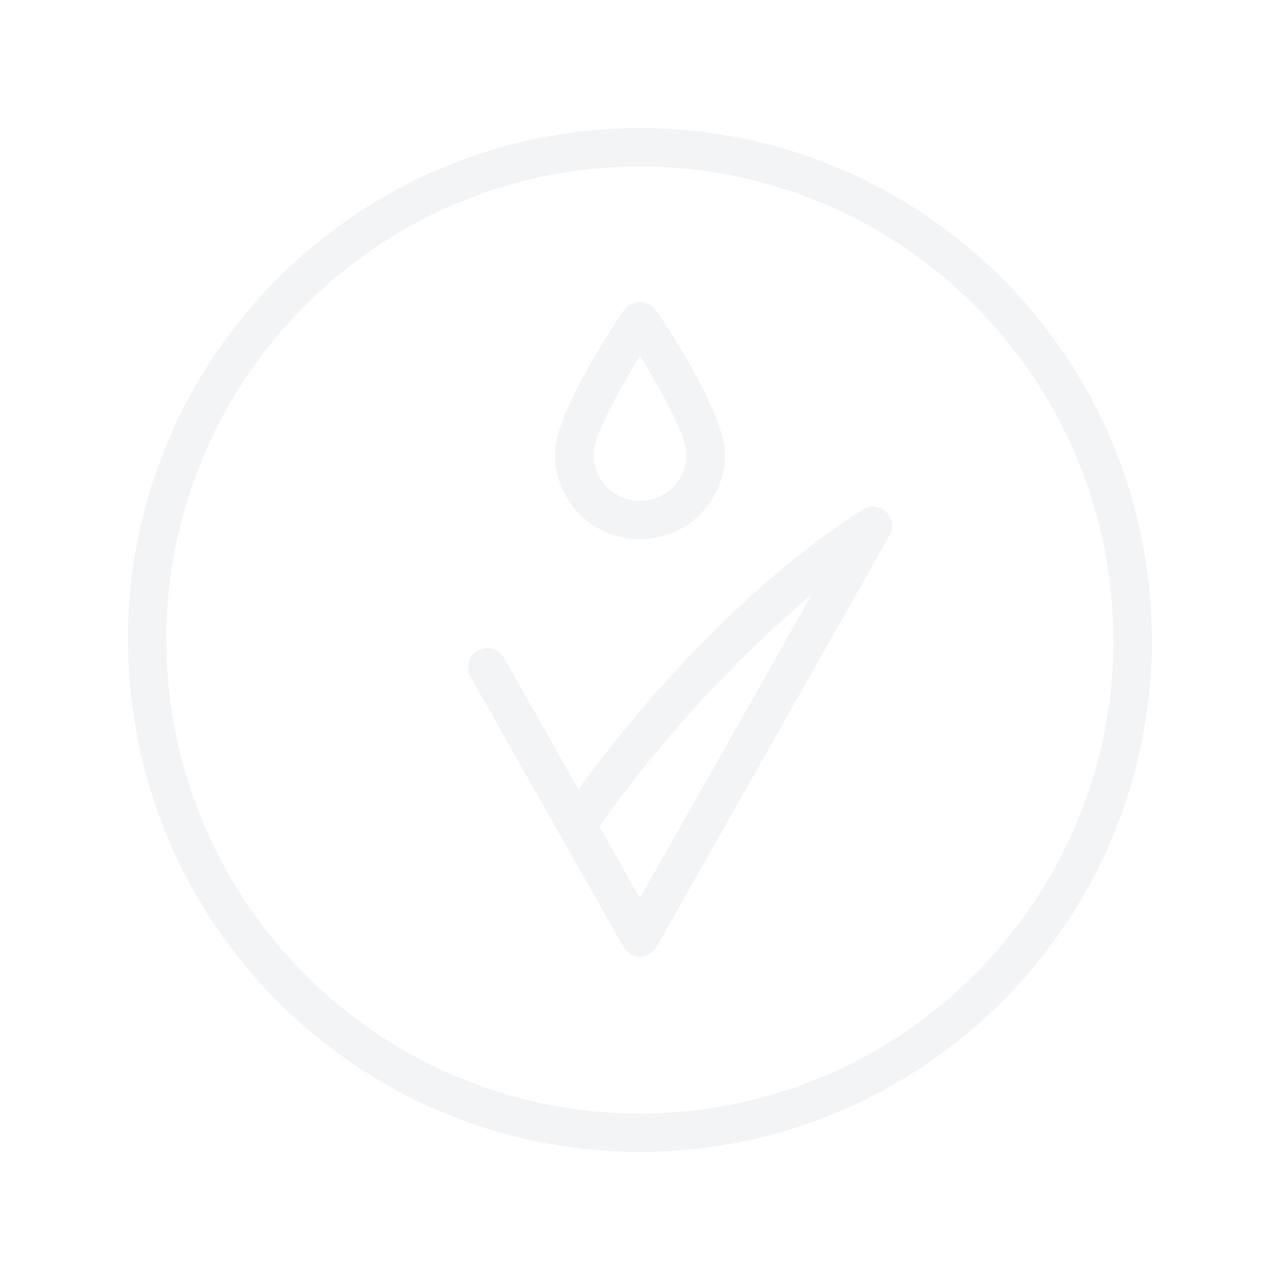 AVENE Couvrance Concealer Stick SPF20 Green 4g